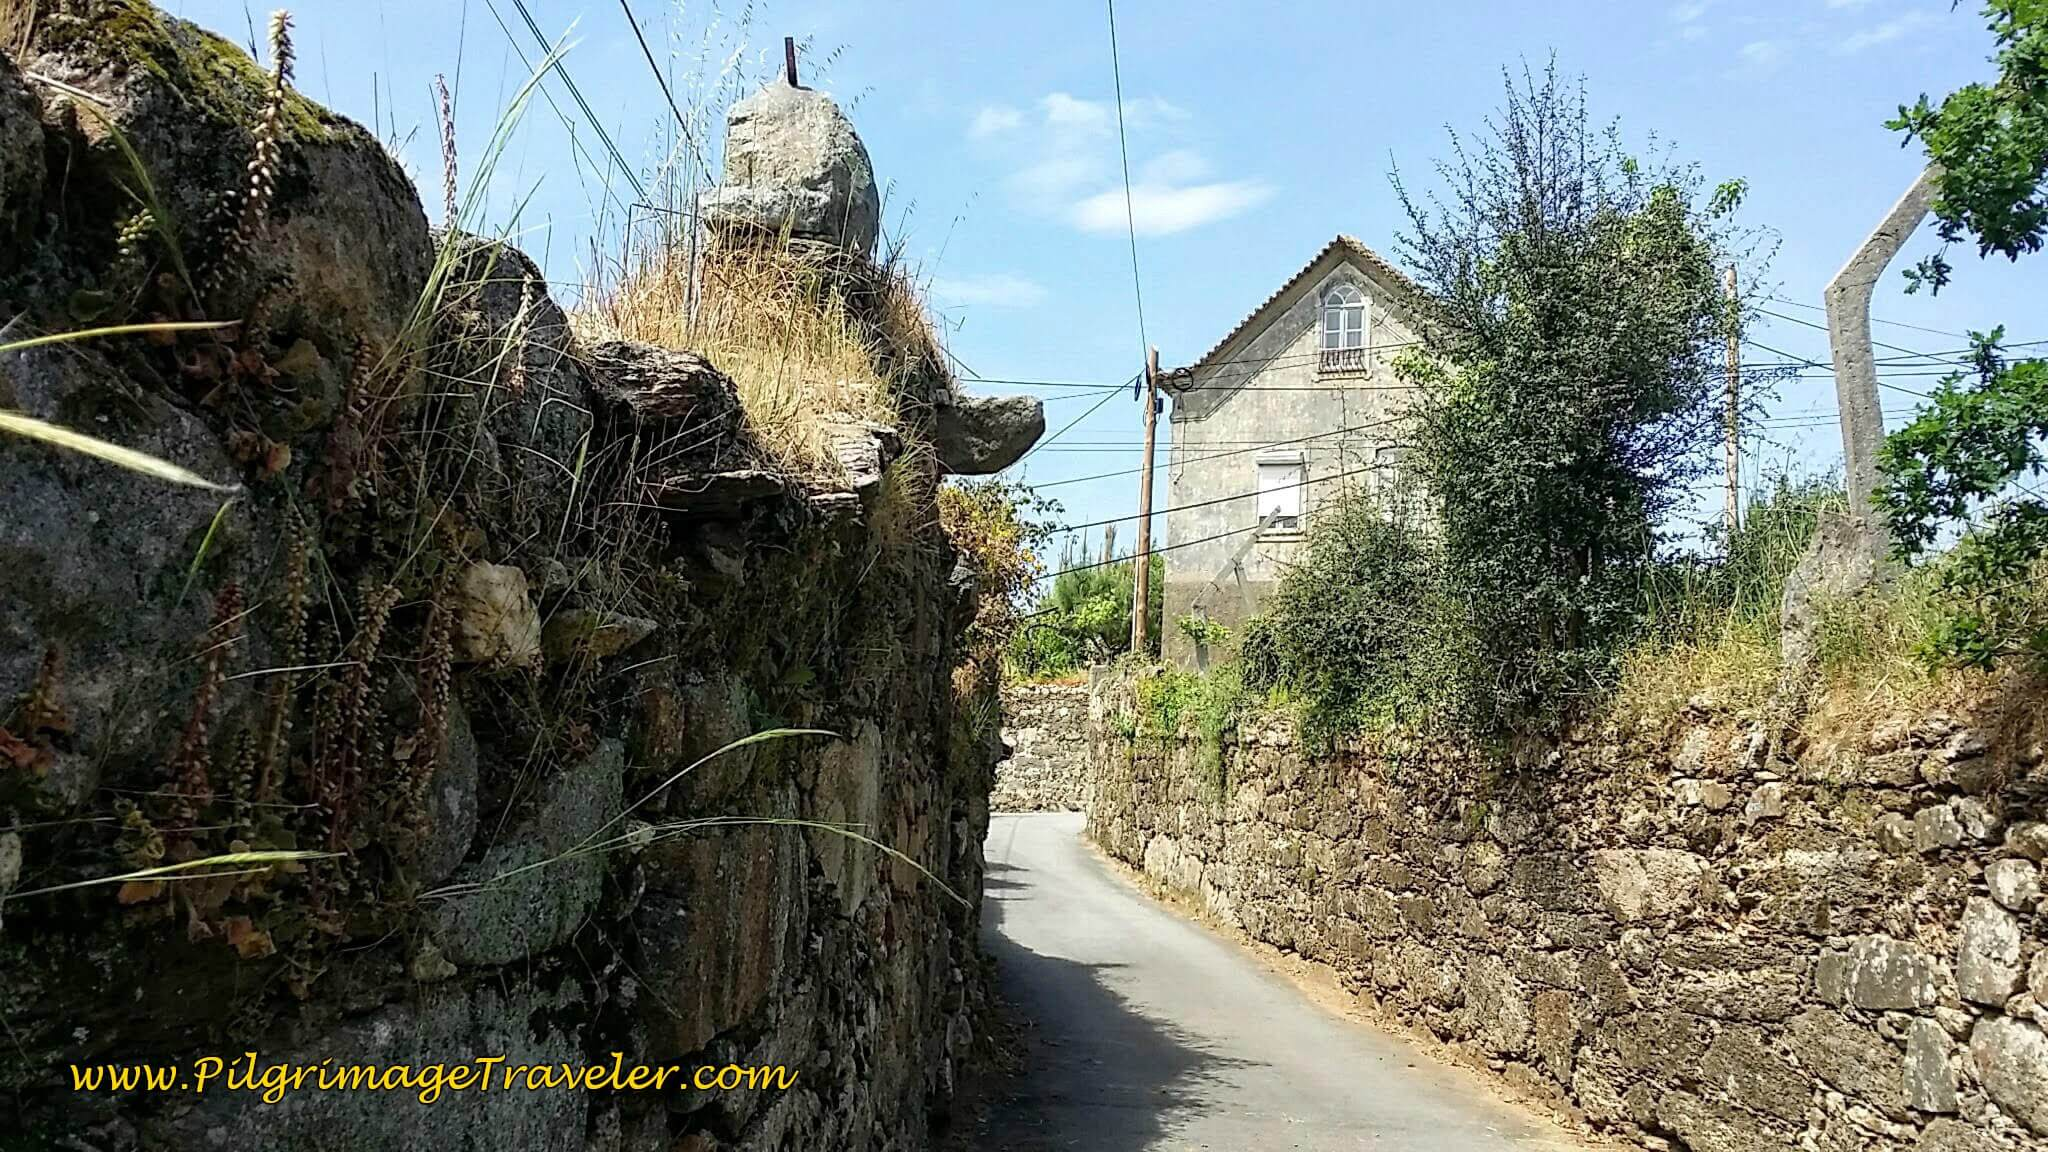 Quaint High Walls on the Rua Dom Crisostomo de Aguiar on day thirteen of the Portuguese Camino